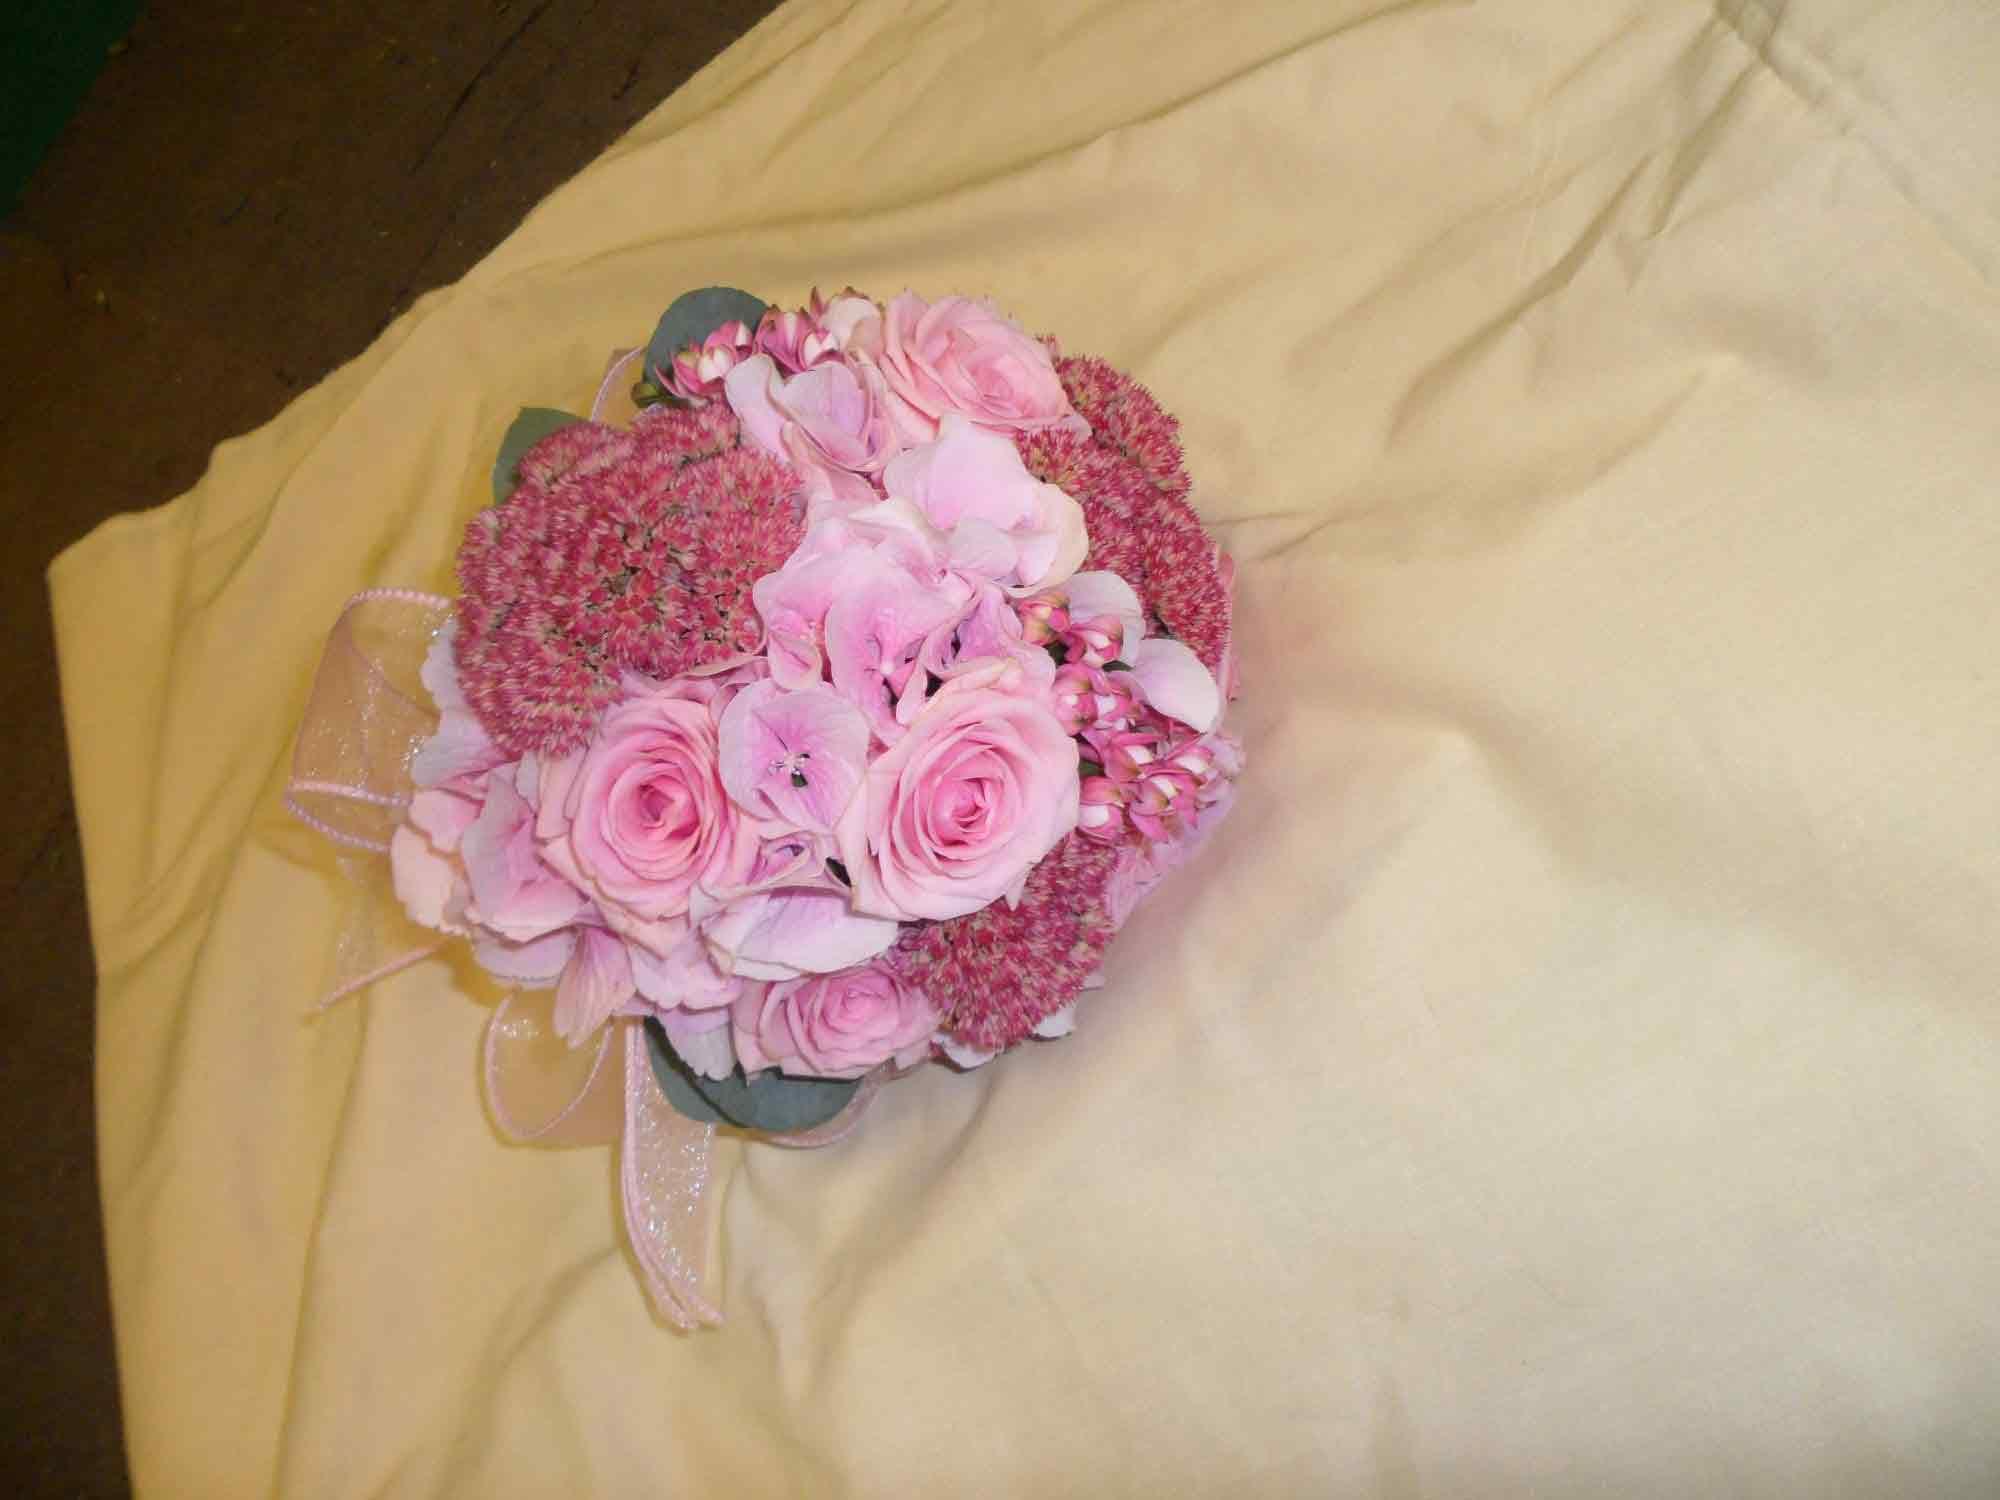 rosebuds_florists_bridal_pink_flowers